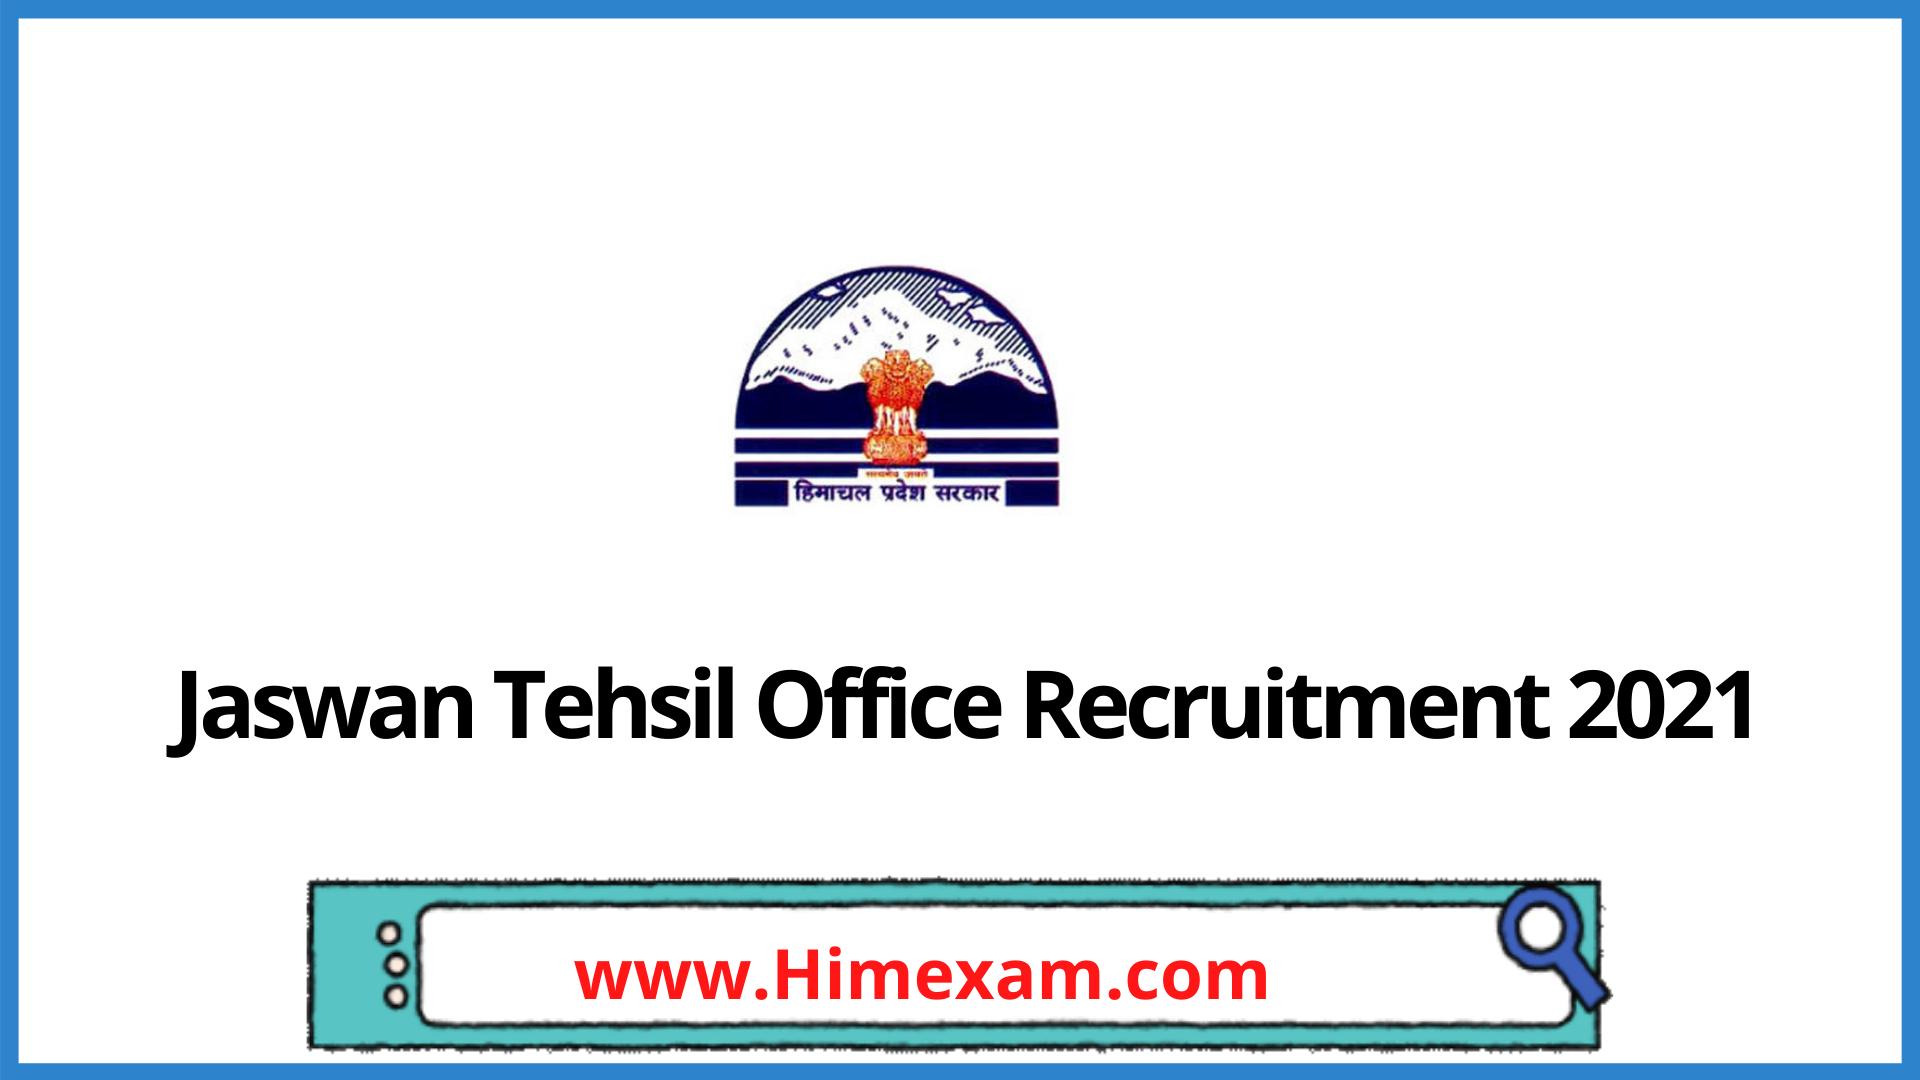 Jaswan Tehsil Office Recruitment 2021